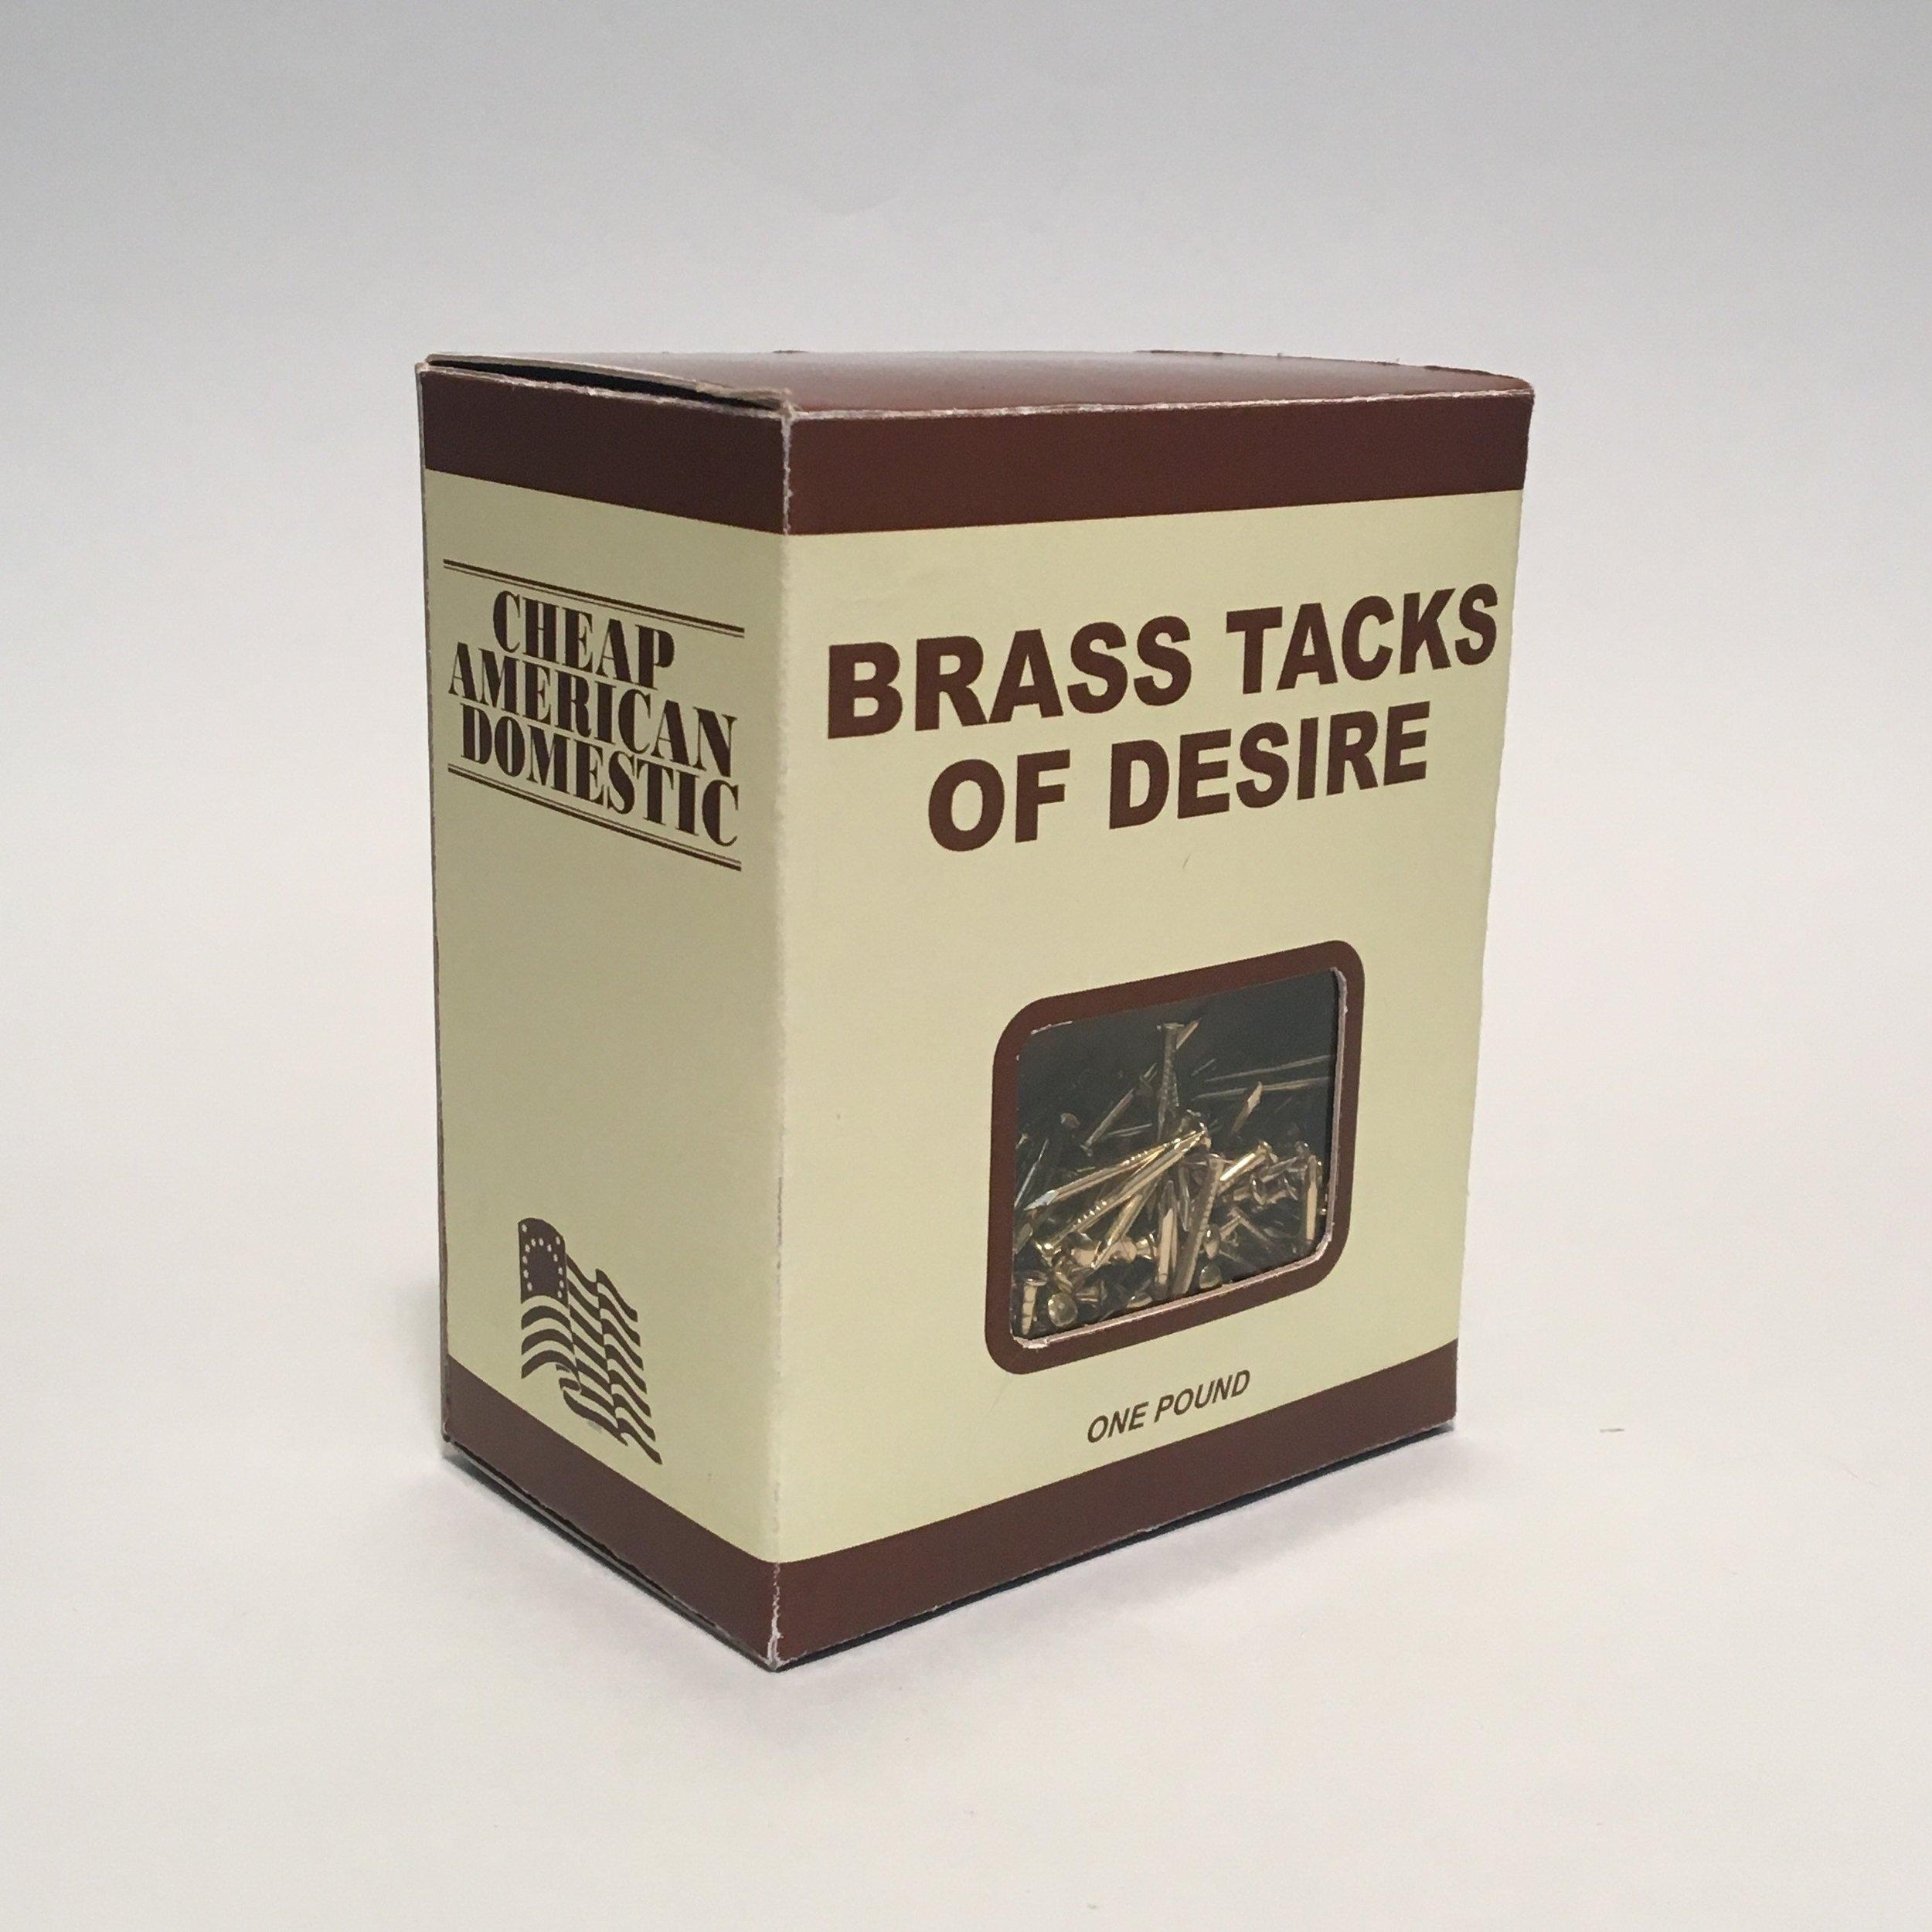 Brass Tacks of Desire